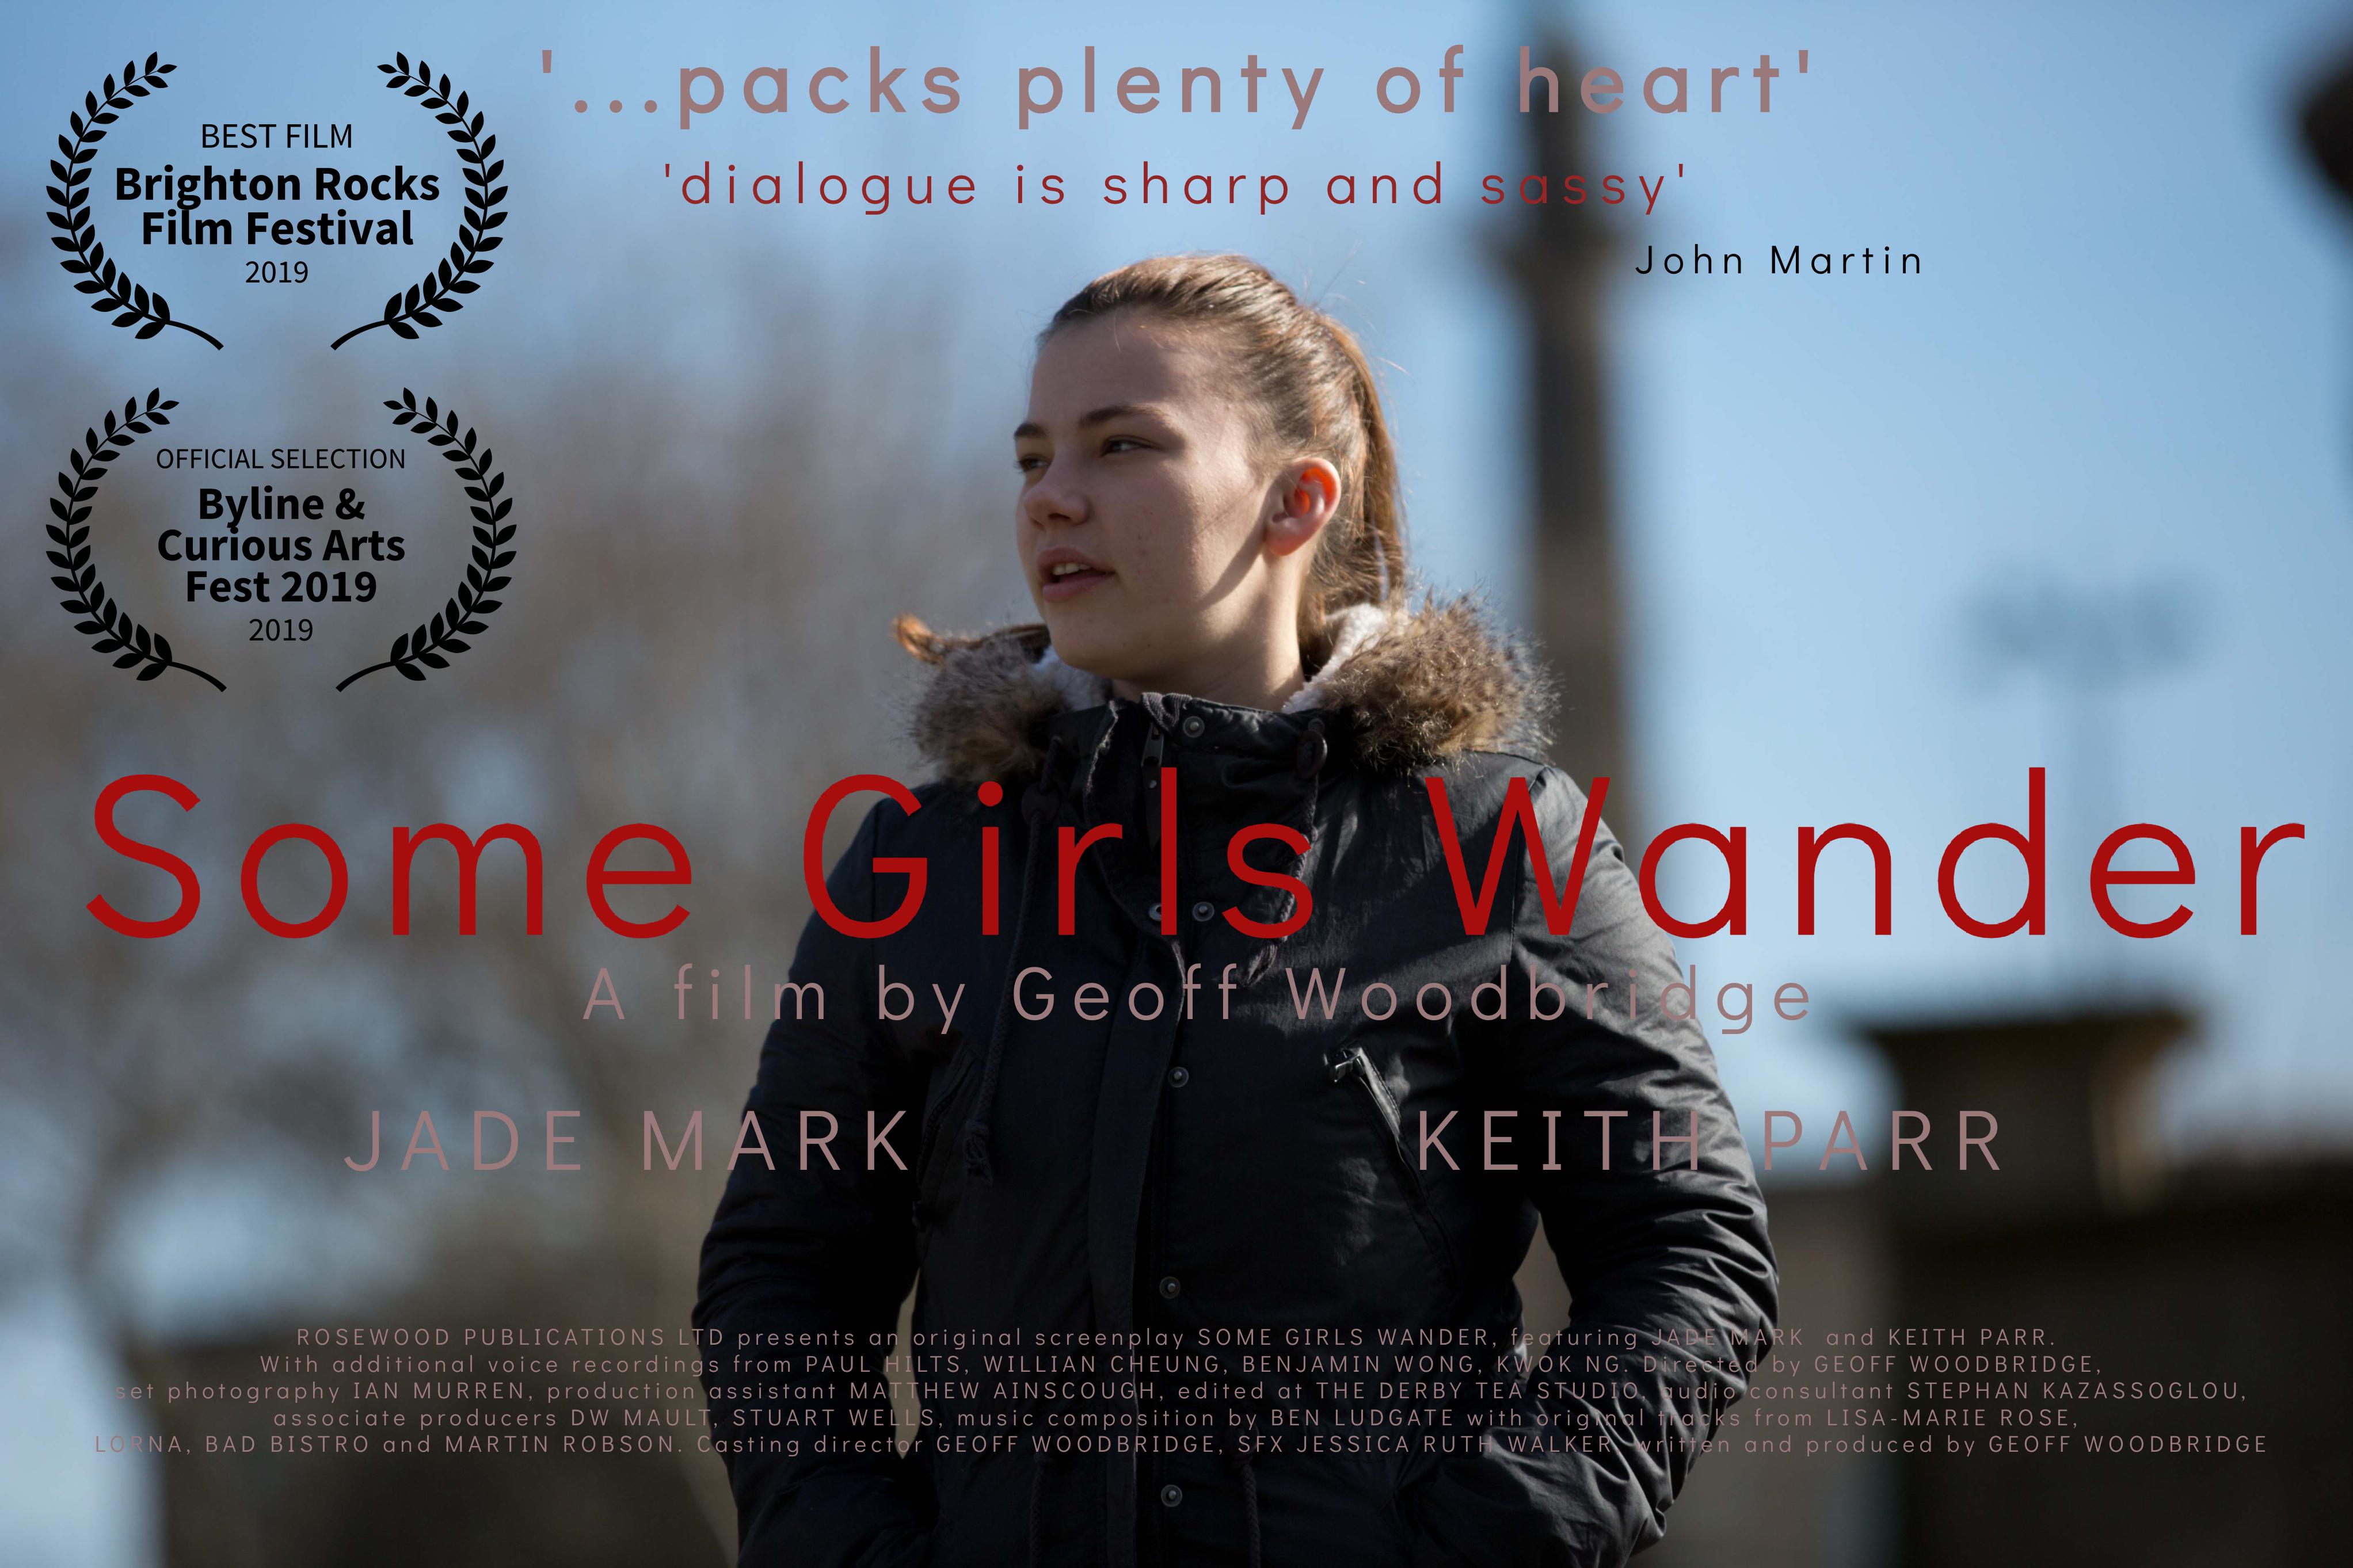 Some Girls Wander: Geoff Woodbridge's Ode to the Lost and Broken